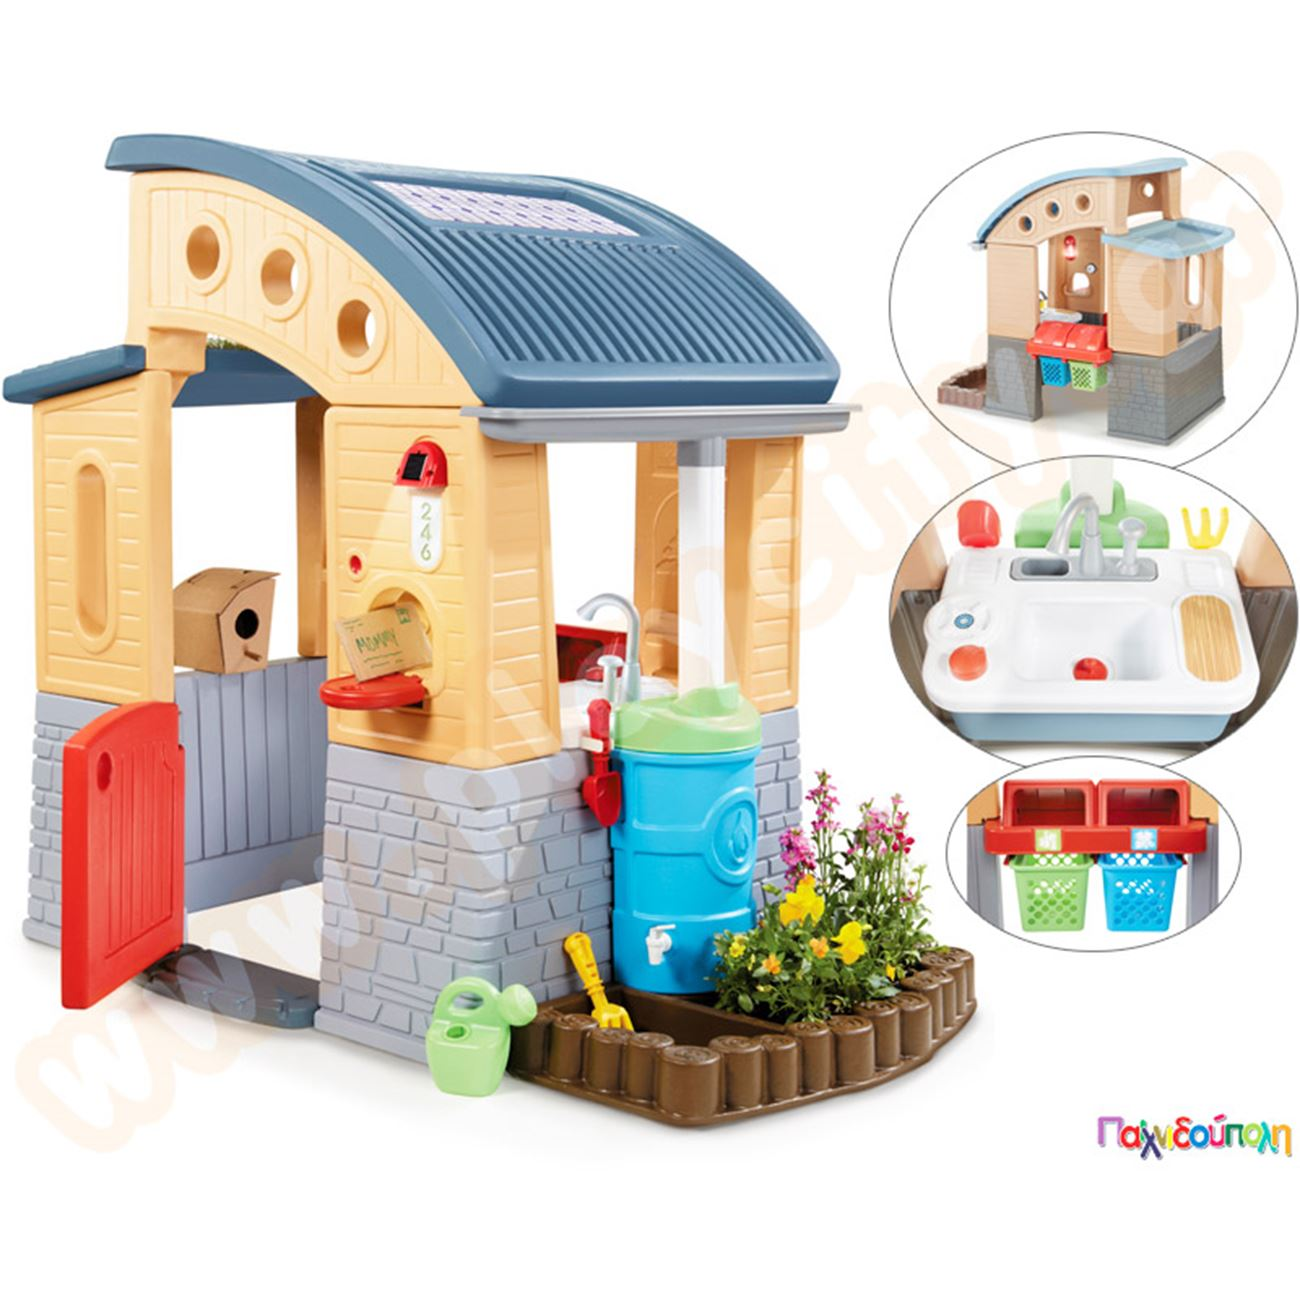 4b412d2a7b66 Παιχνίδια Εξωτερικού Χώρου και Μίμησης Little Tikes Πλαστικό Παιδικό ...